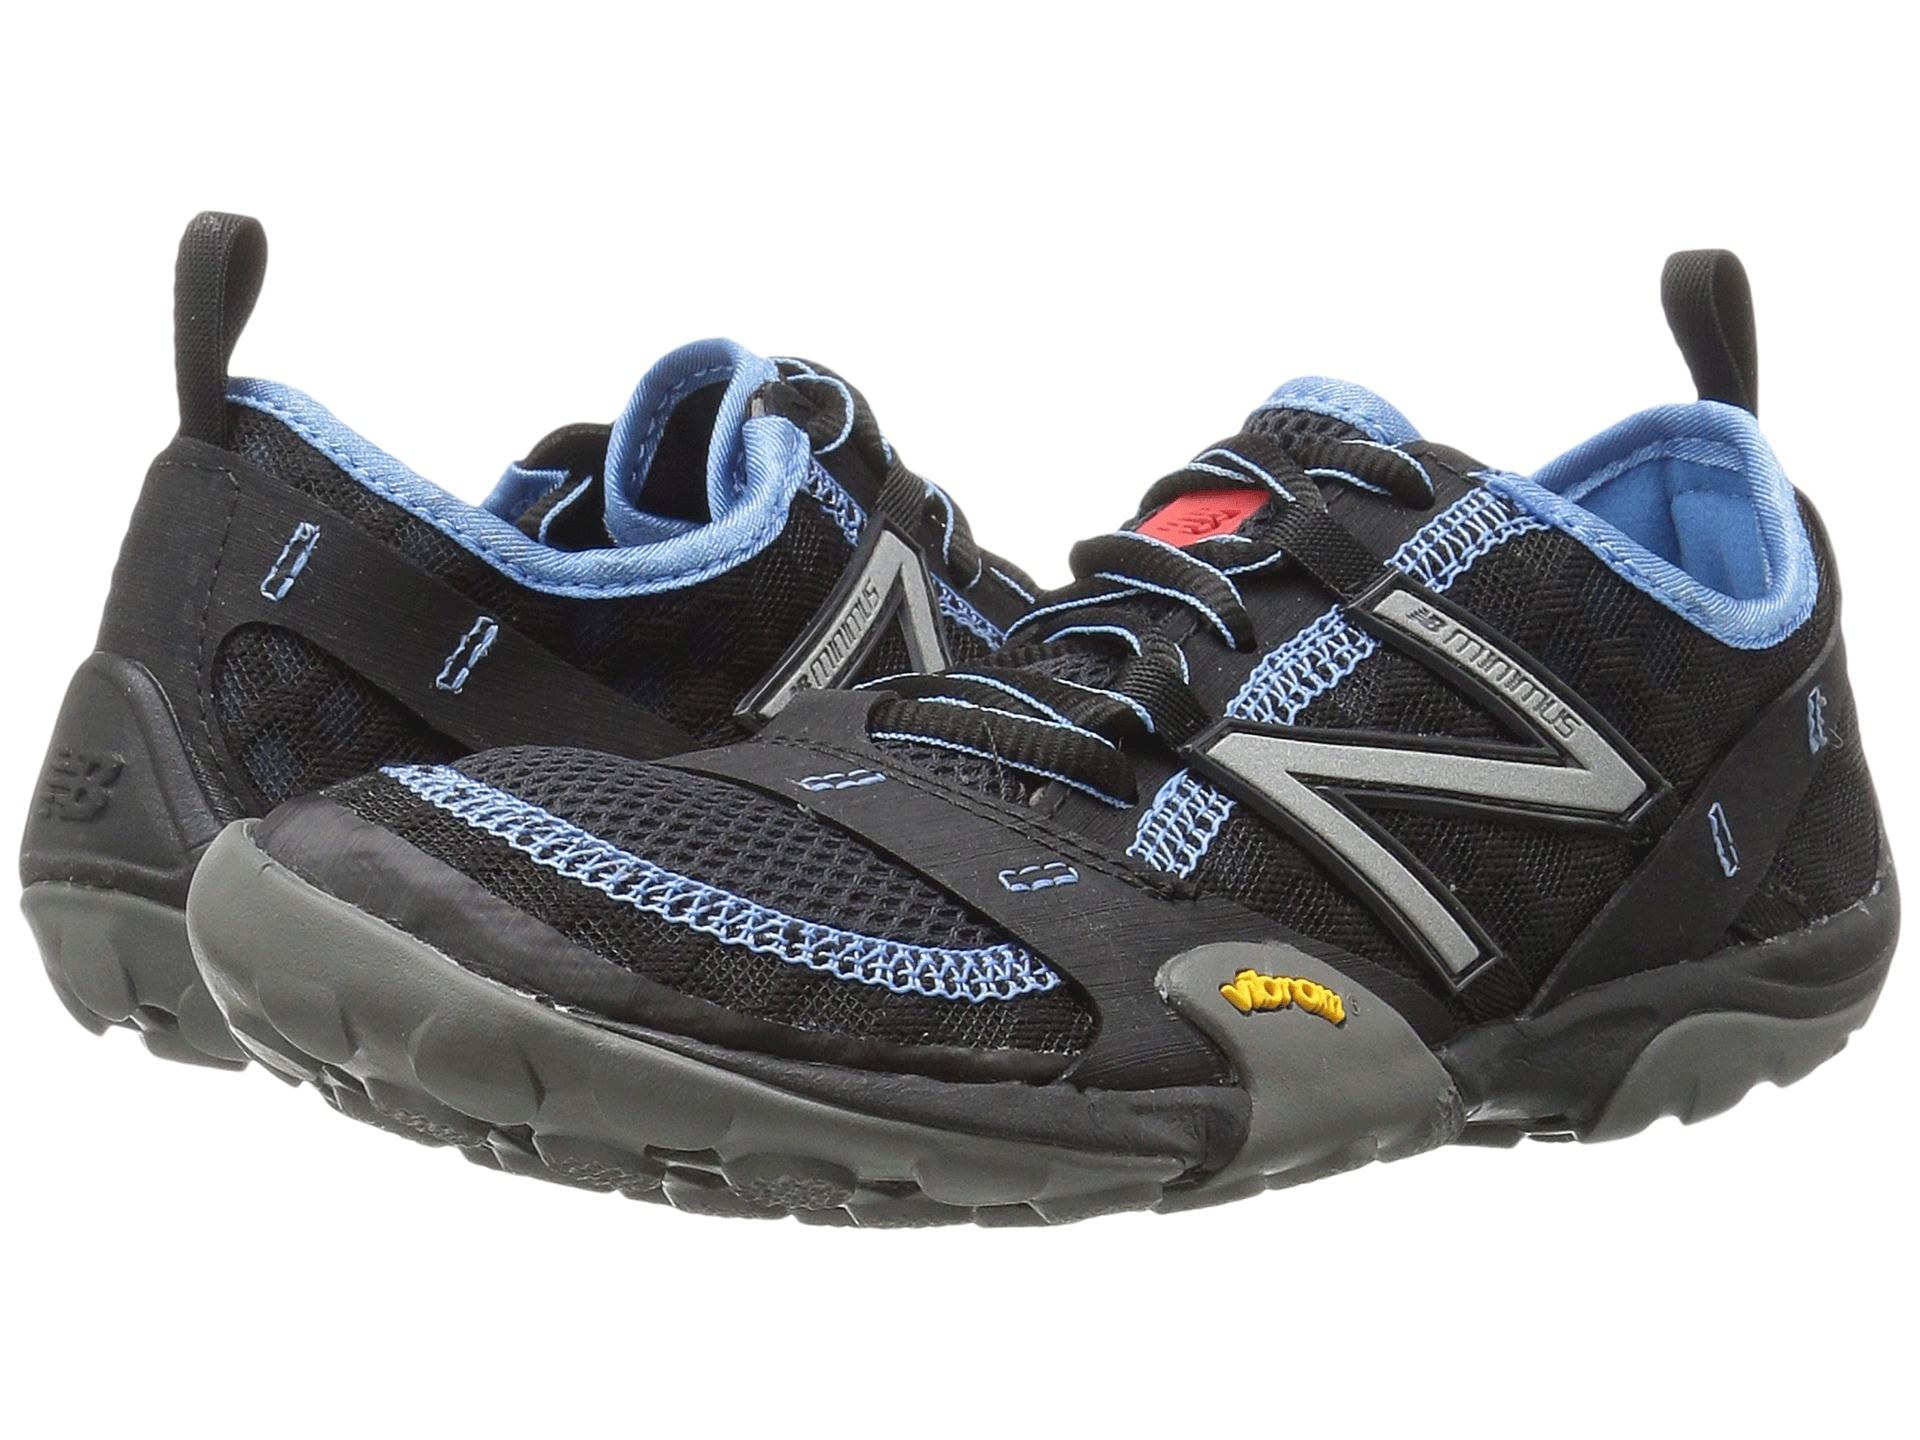 New Balance Minimus Shoes Zappos